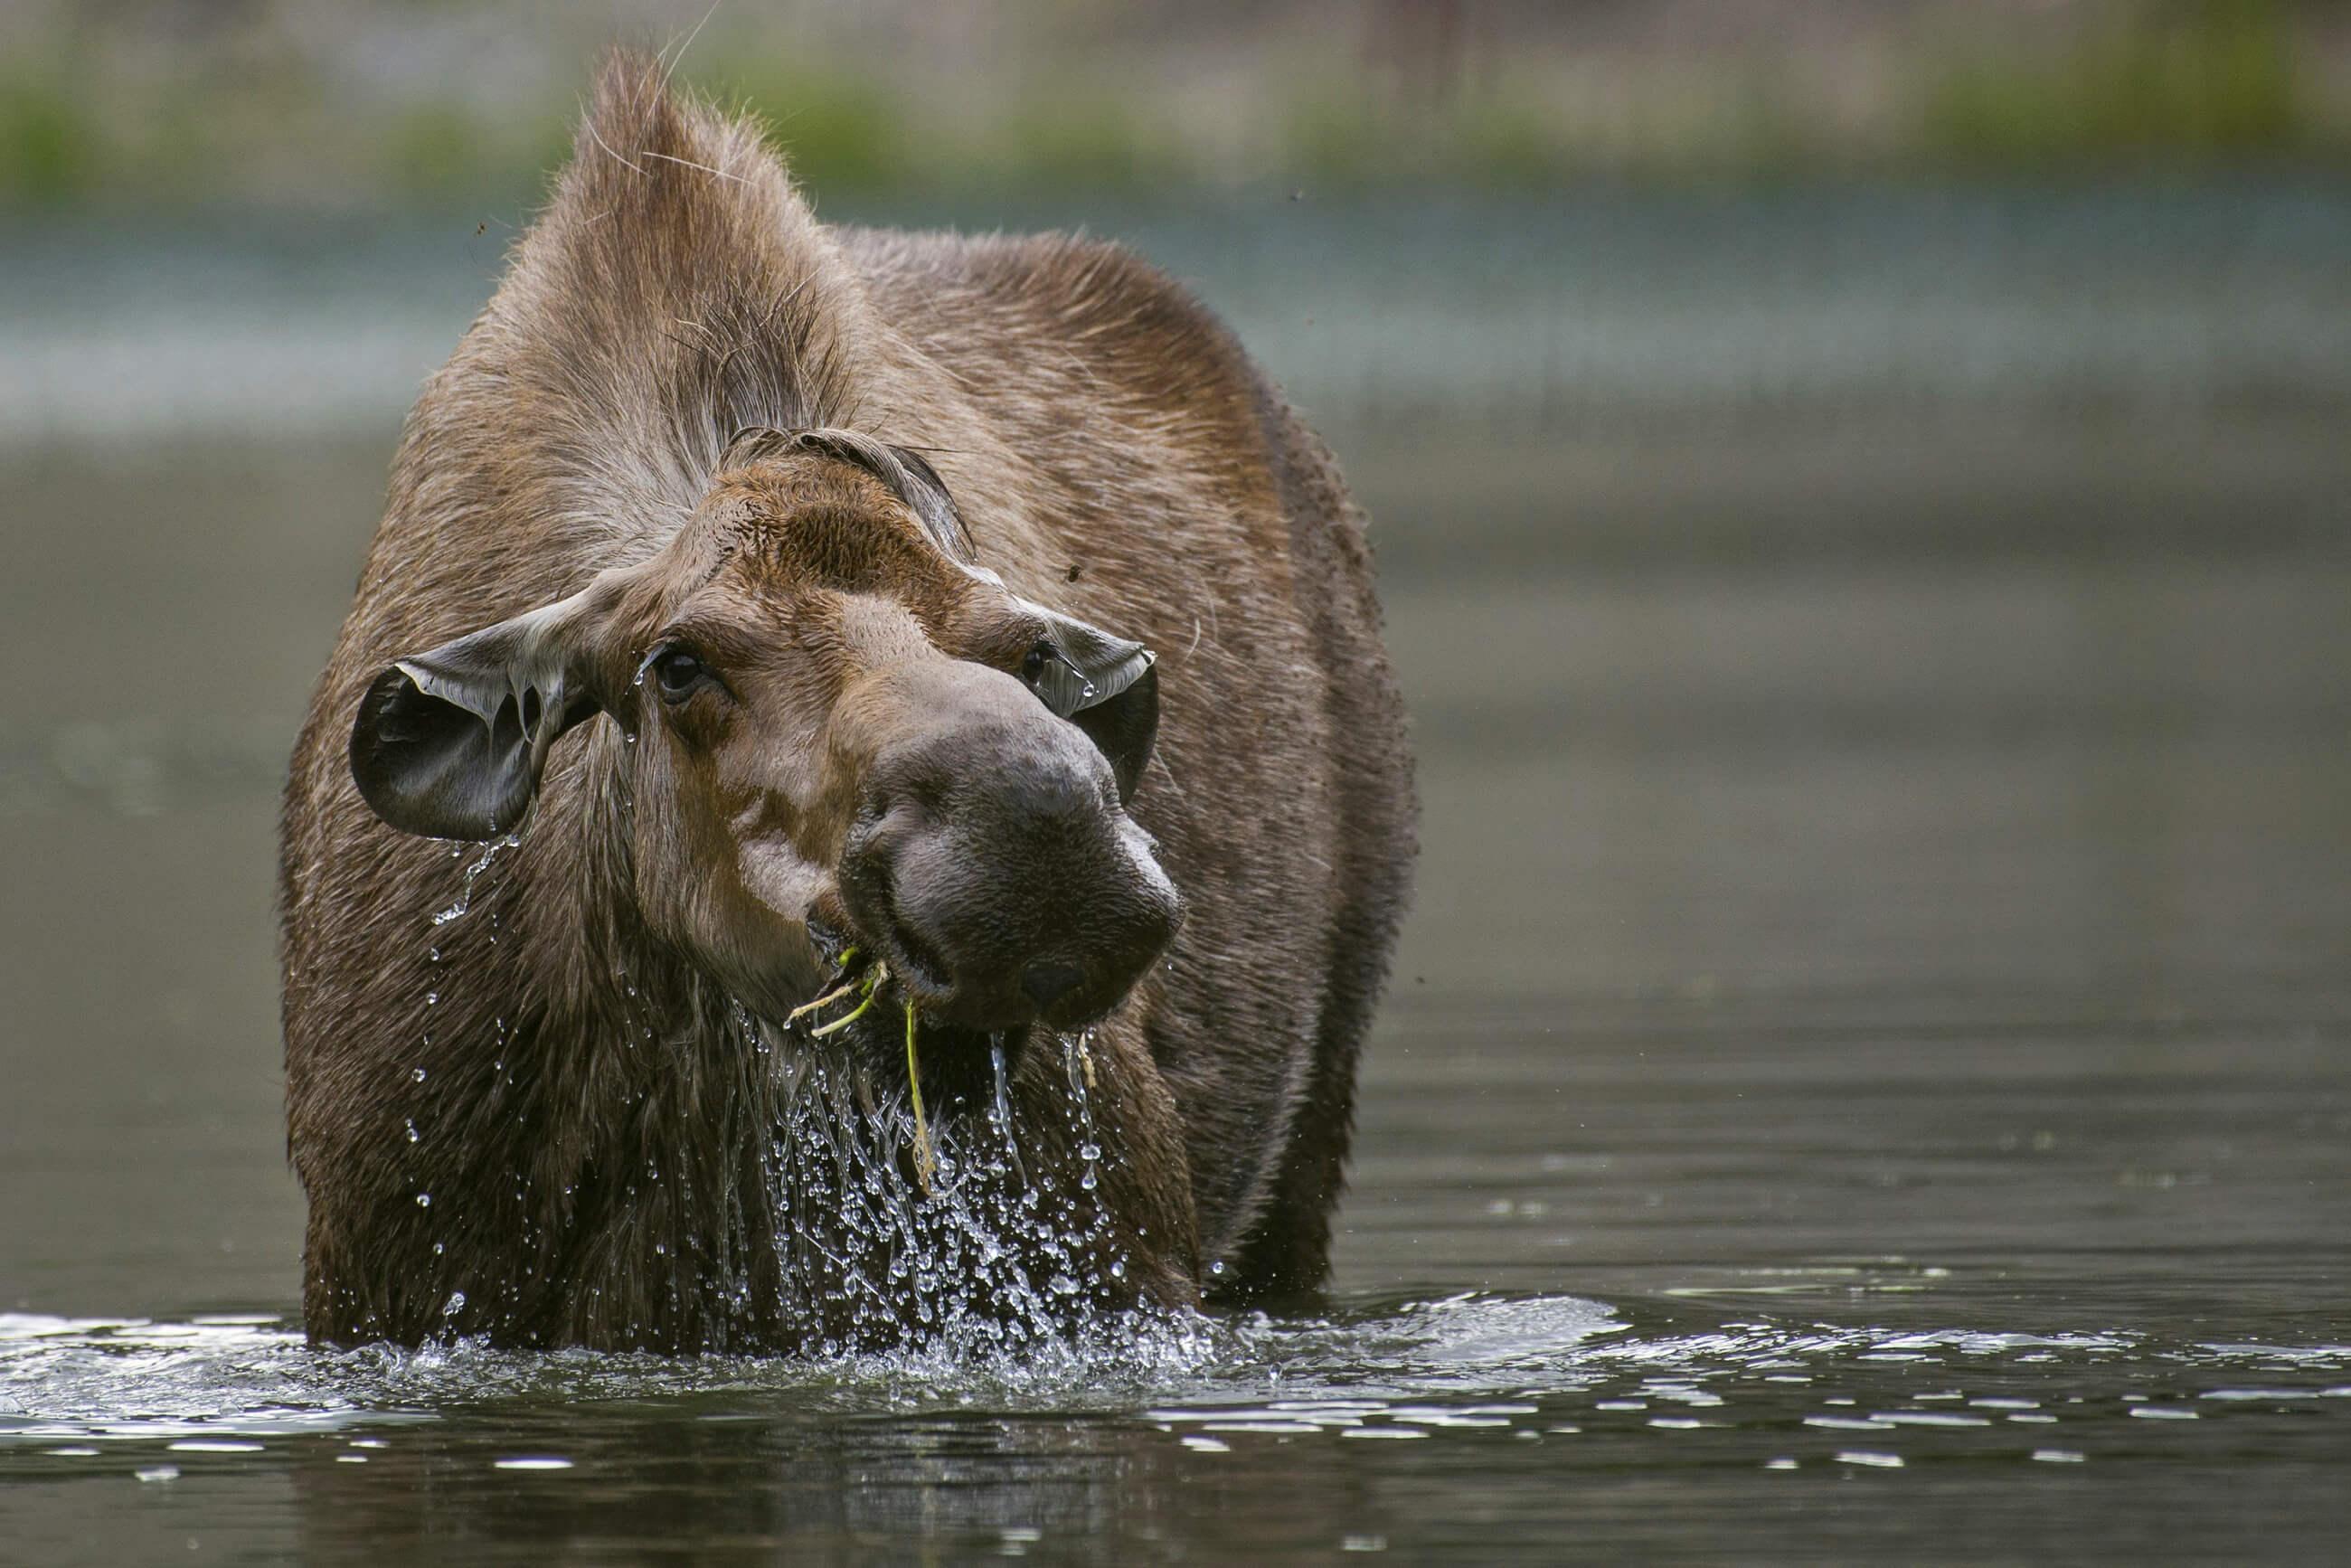 https://bubo.sk/uploads/galleries/16051/pxb_aljaska_moose-3933058-1.jpg